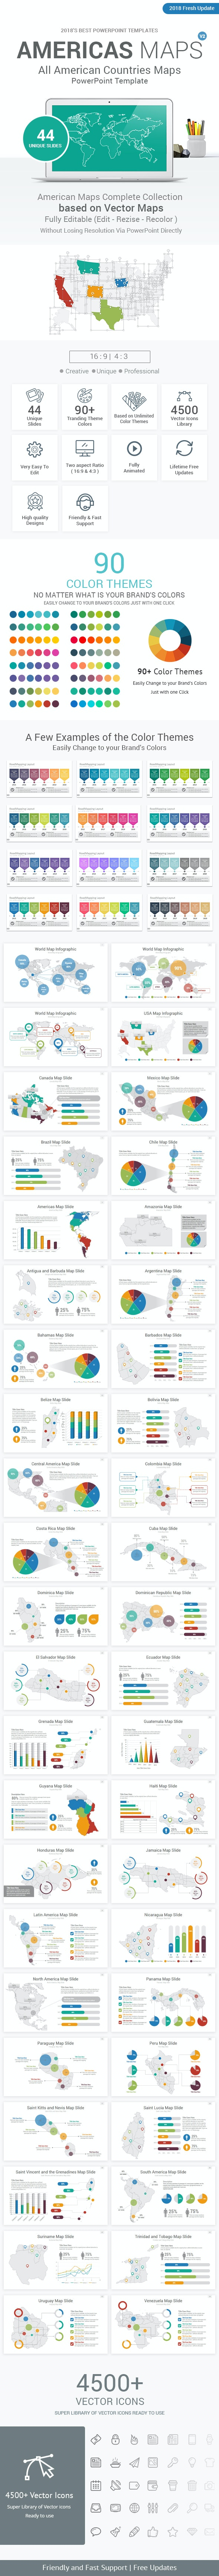 Americas Maps PowerPoint Presentation Template - Creative PowerPoint Templates